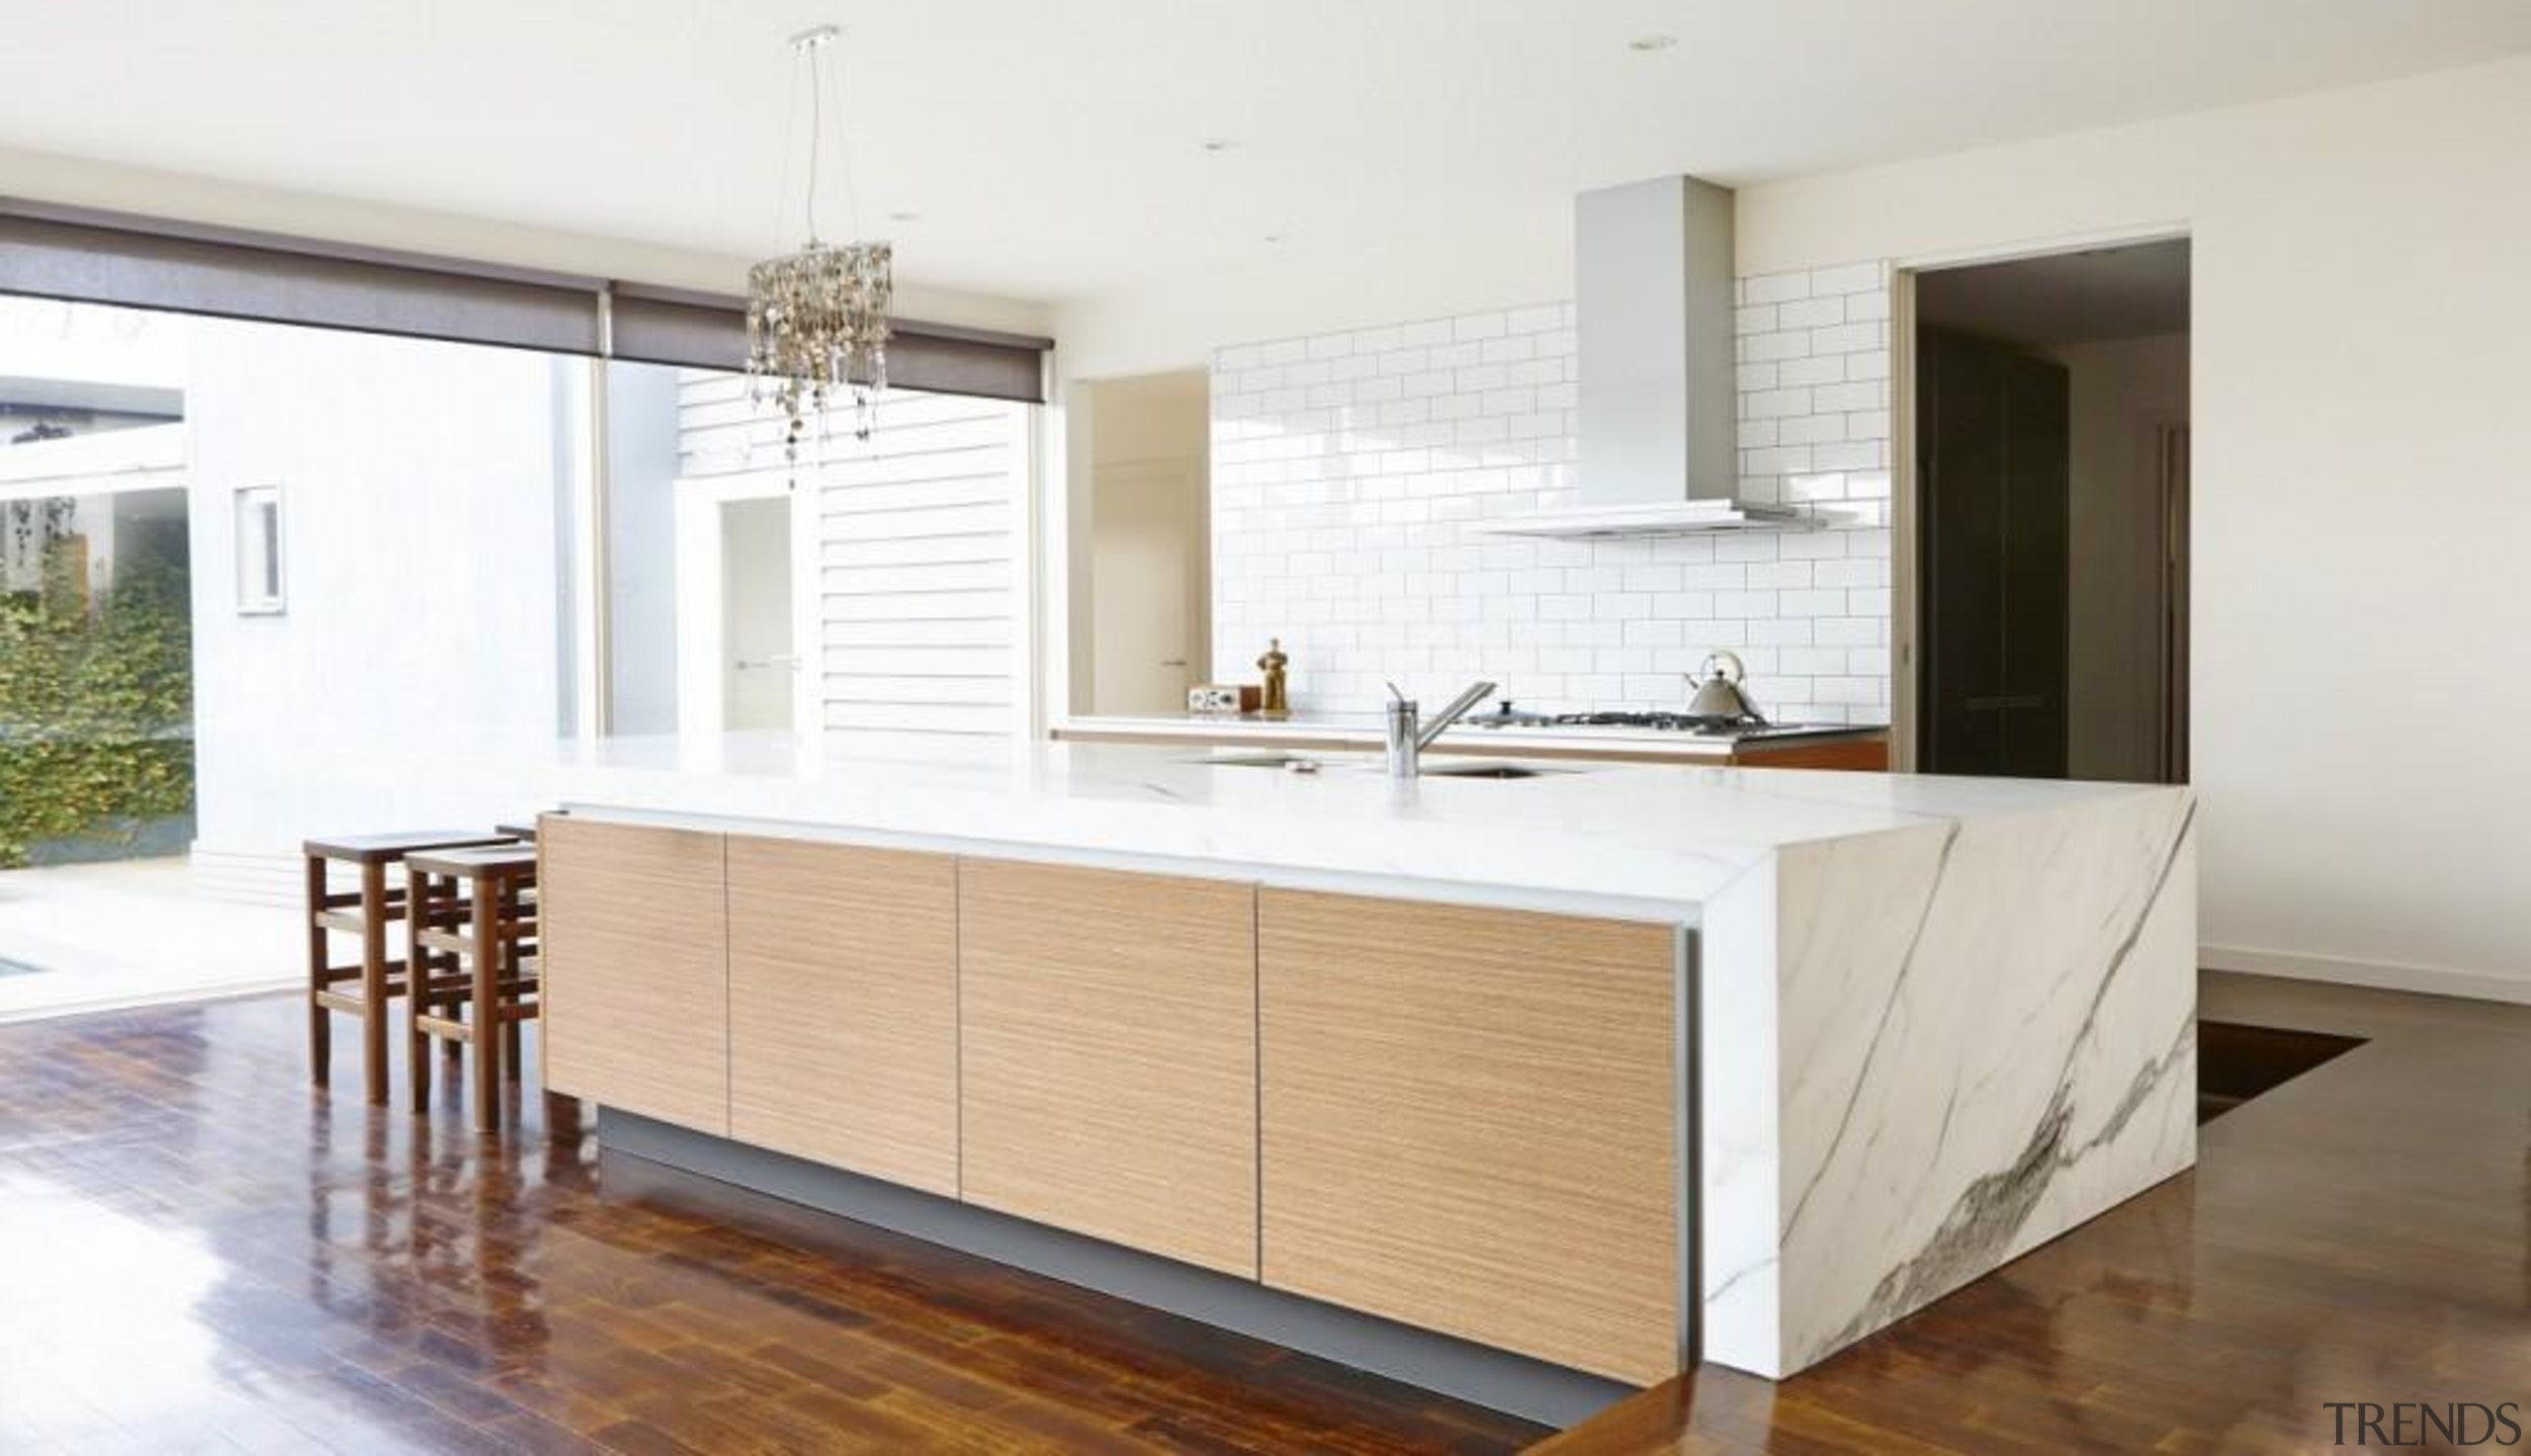 Pepper Design - with Teak finish and Aluminum cabinetry, countertop, cuisine classique, floor, interior design, kitchen, real estate, room, wood flooring, white